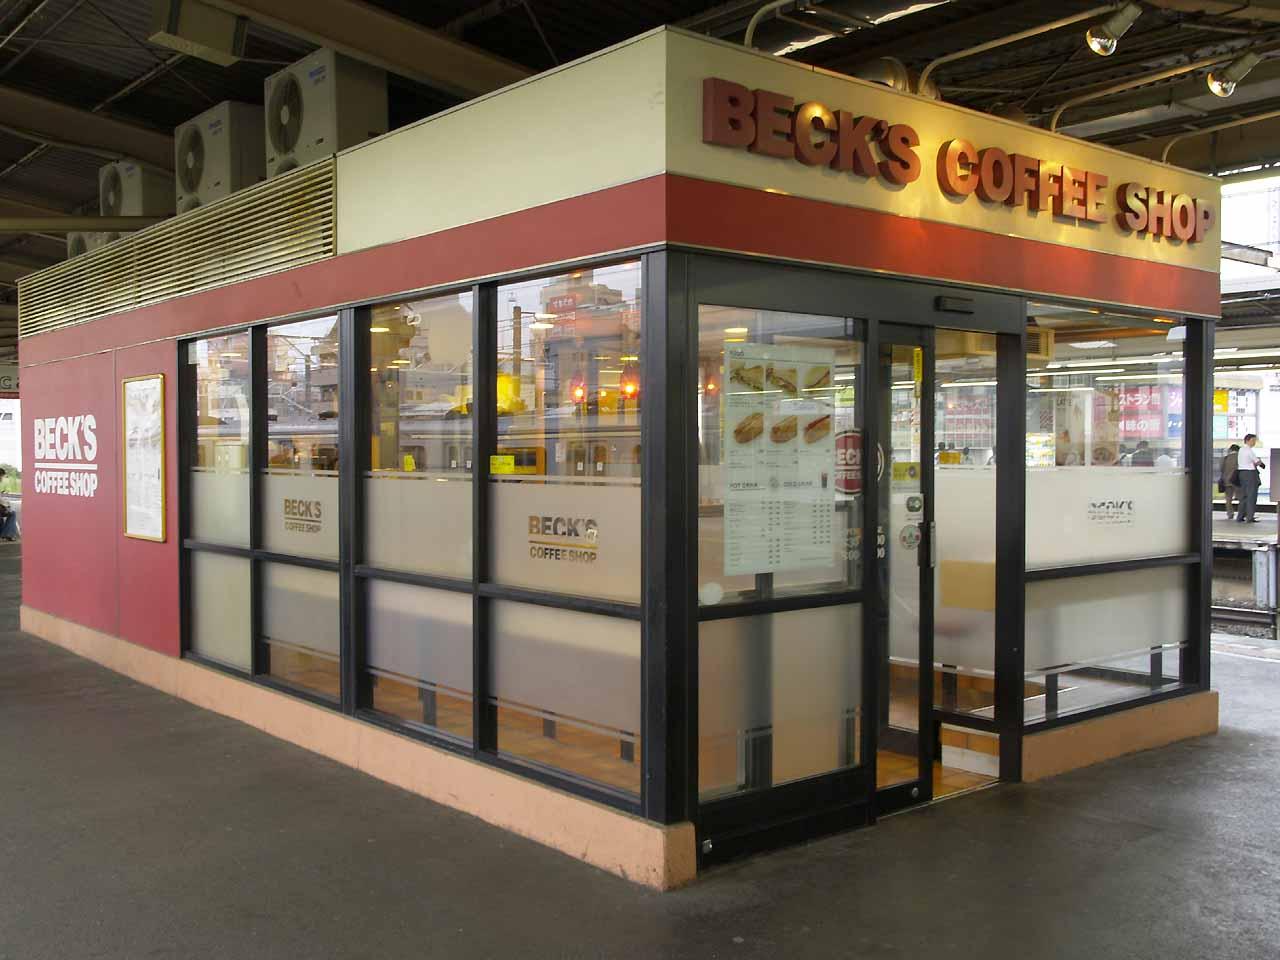 File beck s coffee shop maihama jpg wikimedia commons - File Beck S Coffee Shop Maihama Jpg Wikimedia Commons 1